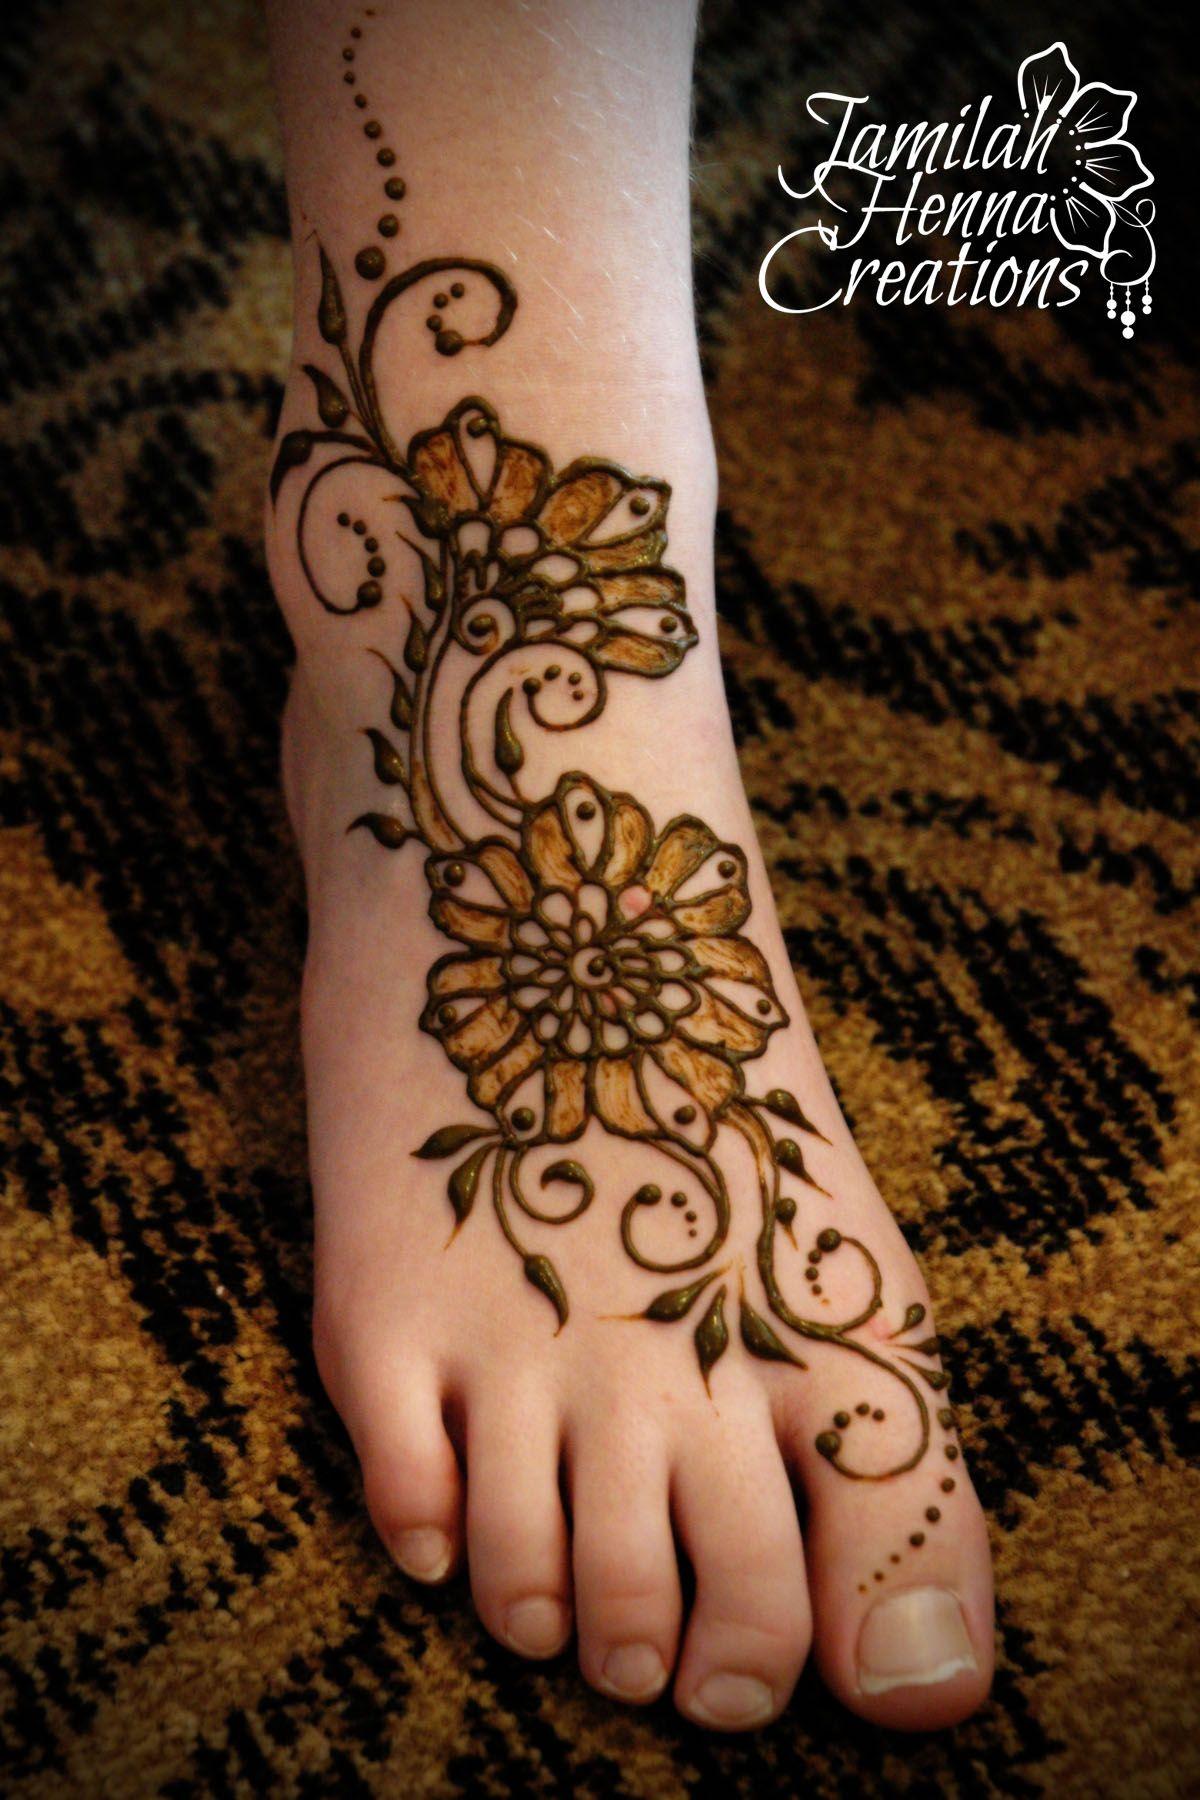 Khaleeji Henna Designs Tattoo: Henna Gathering 2014 Foot Design Www.JamilahHennaCreations